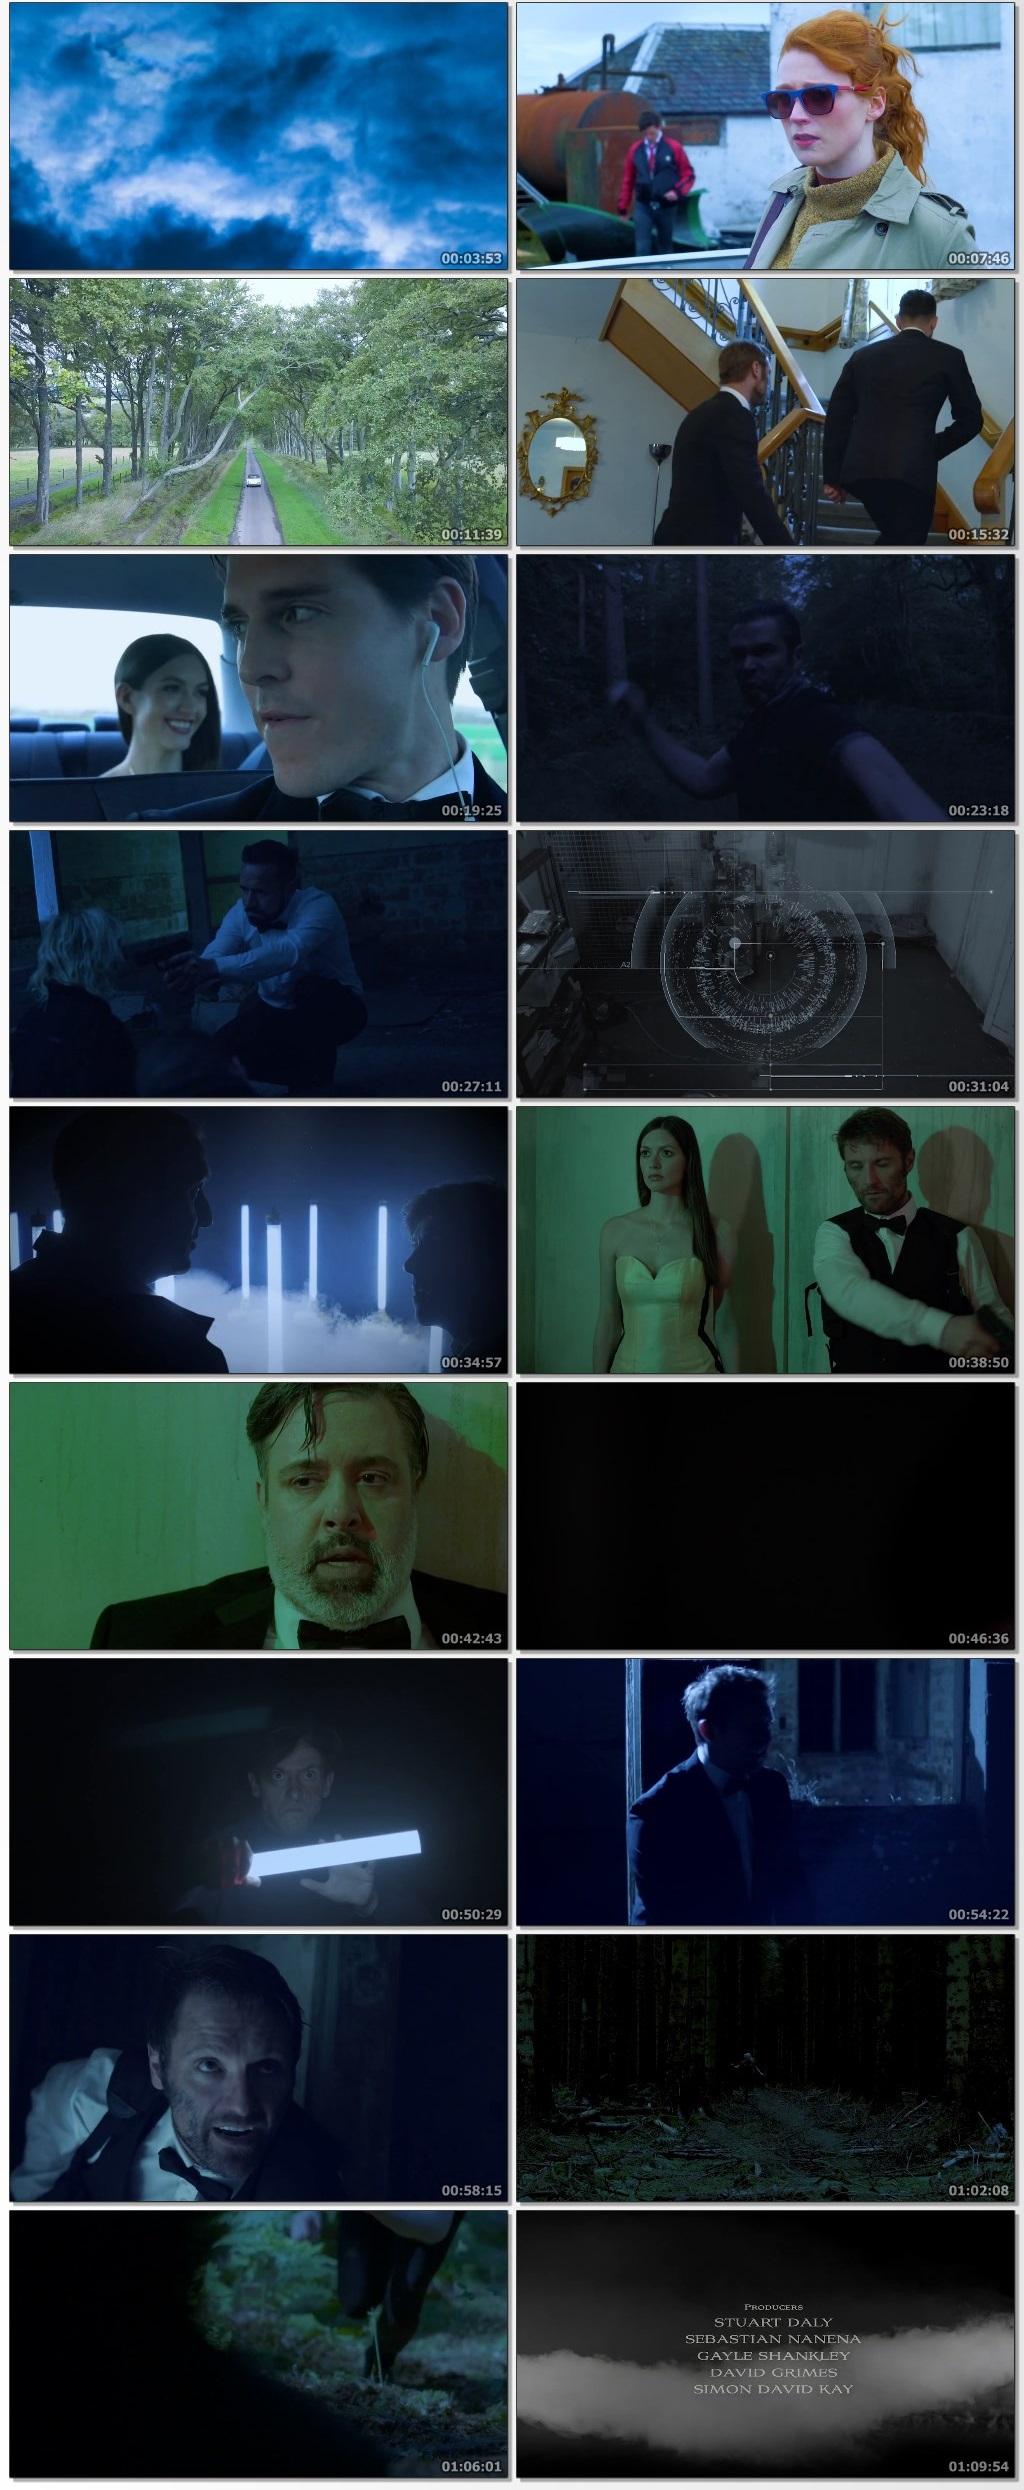 Shadowland-2021-English-720p-www-7-Star-HD-Dev-HDRip-800-MB-1-mkv-thumbs